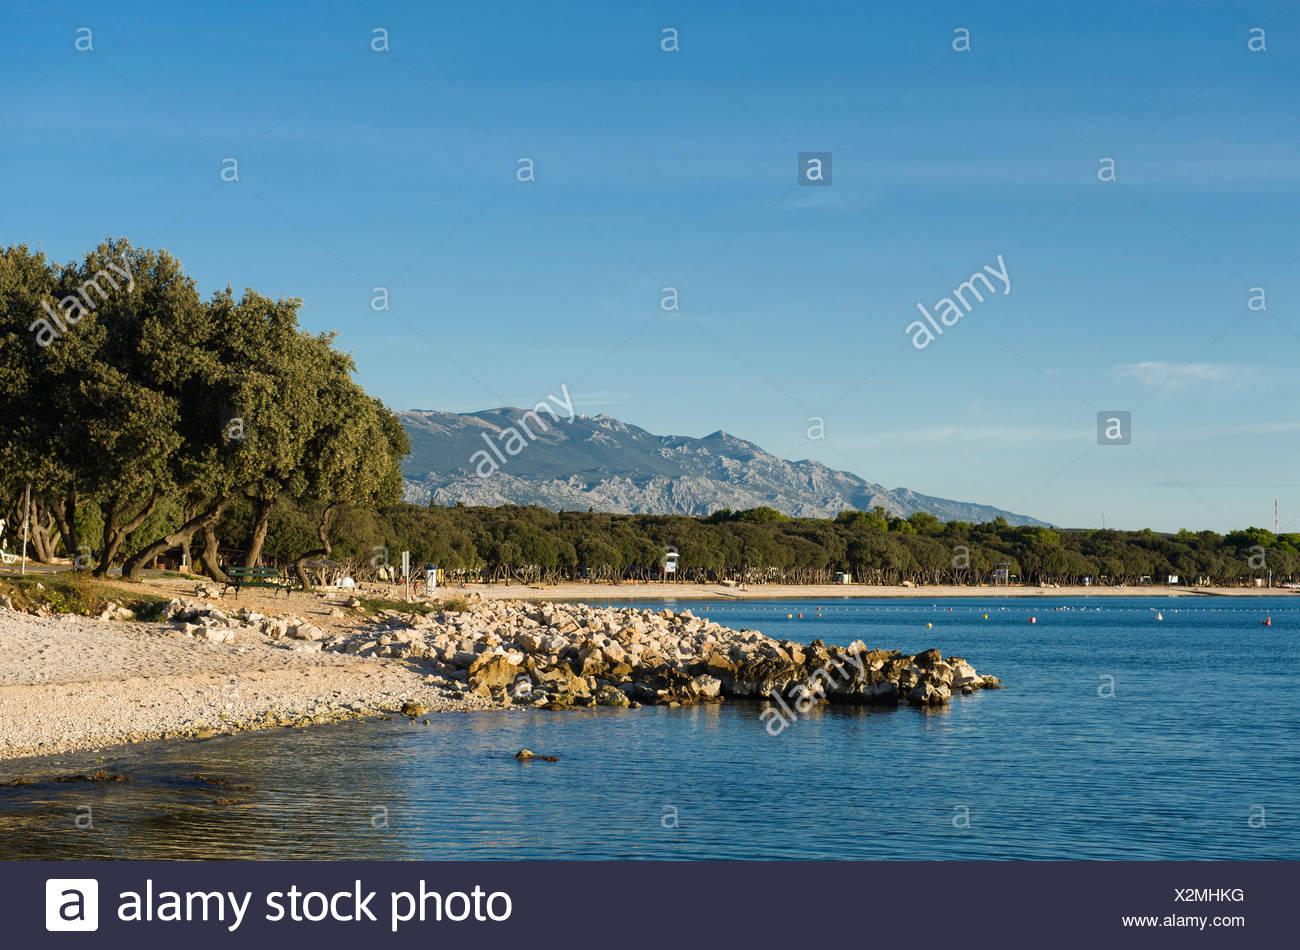 Dalmatian Oaks (Quercus sp.) at a beach, campsite in Novalja, Pag Island, Adriatic Sea, Gulf of Kvarner, Croatia, Europe - Stock Image